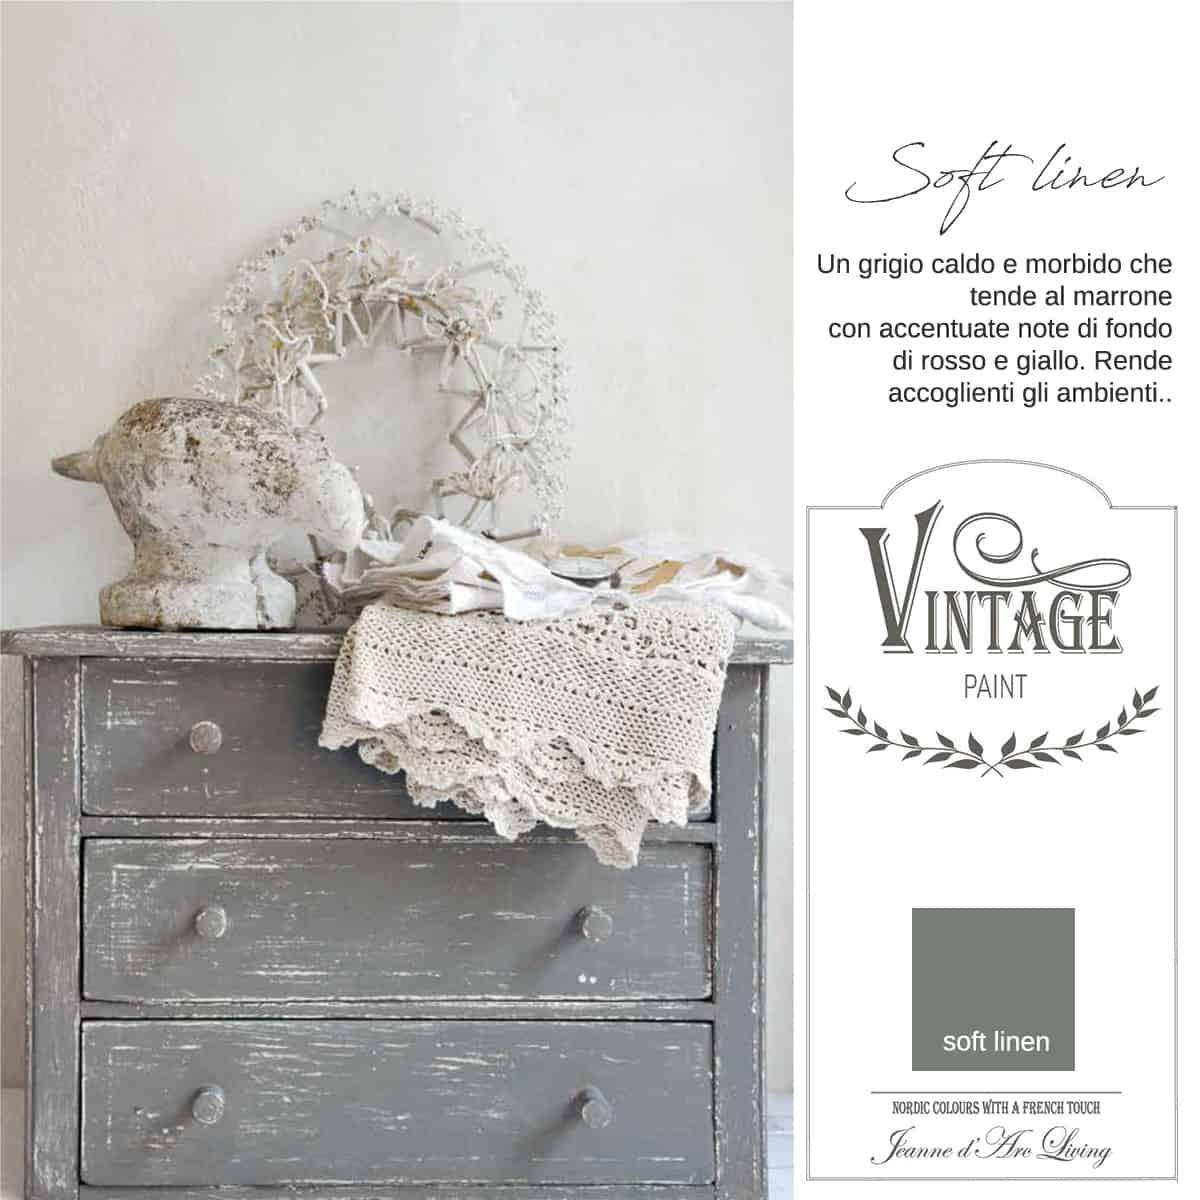 soft linen grigio vintage chalk paint vernici shabby chic autentico look gesso